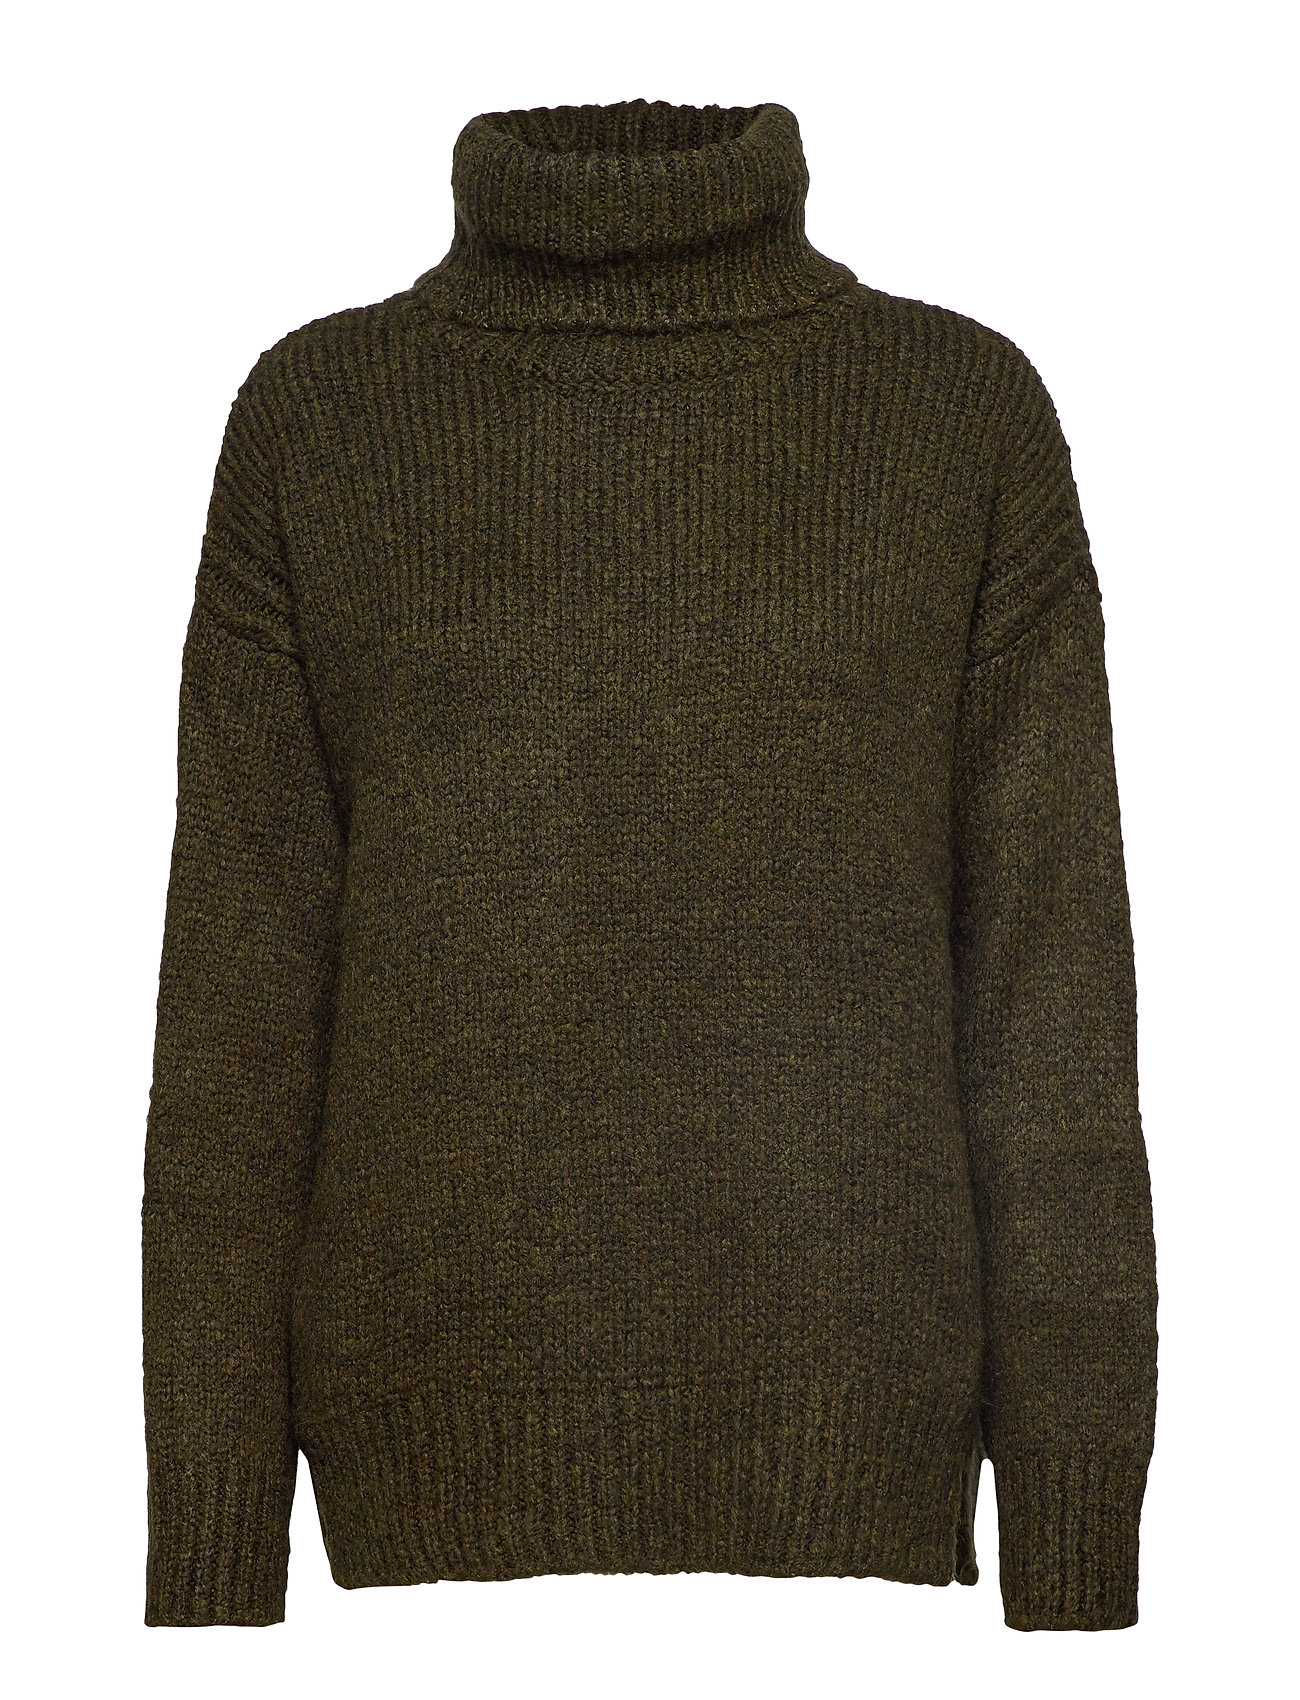 Mango Turtle neck sweater - BEIGE - KHAKI